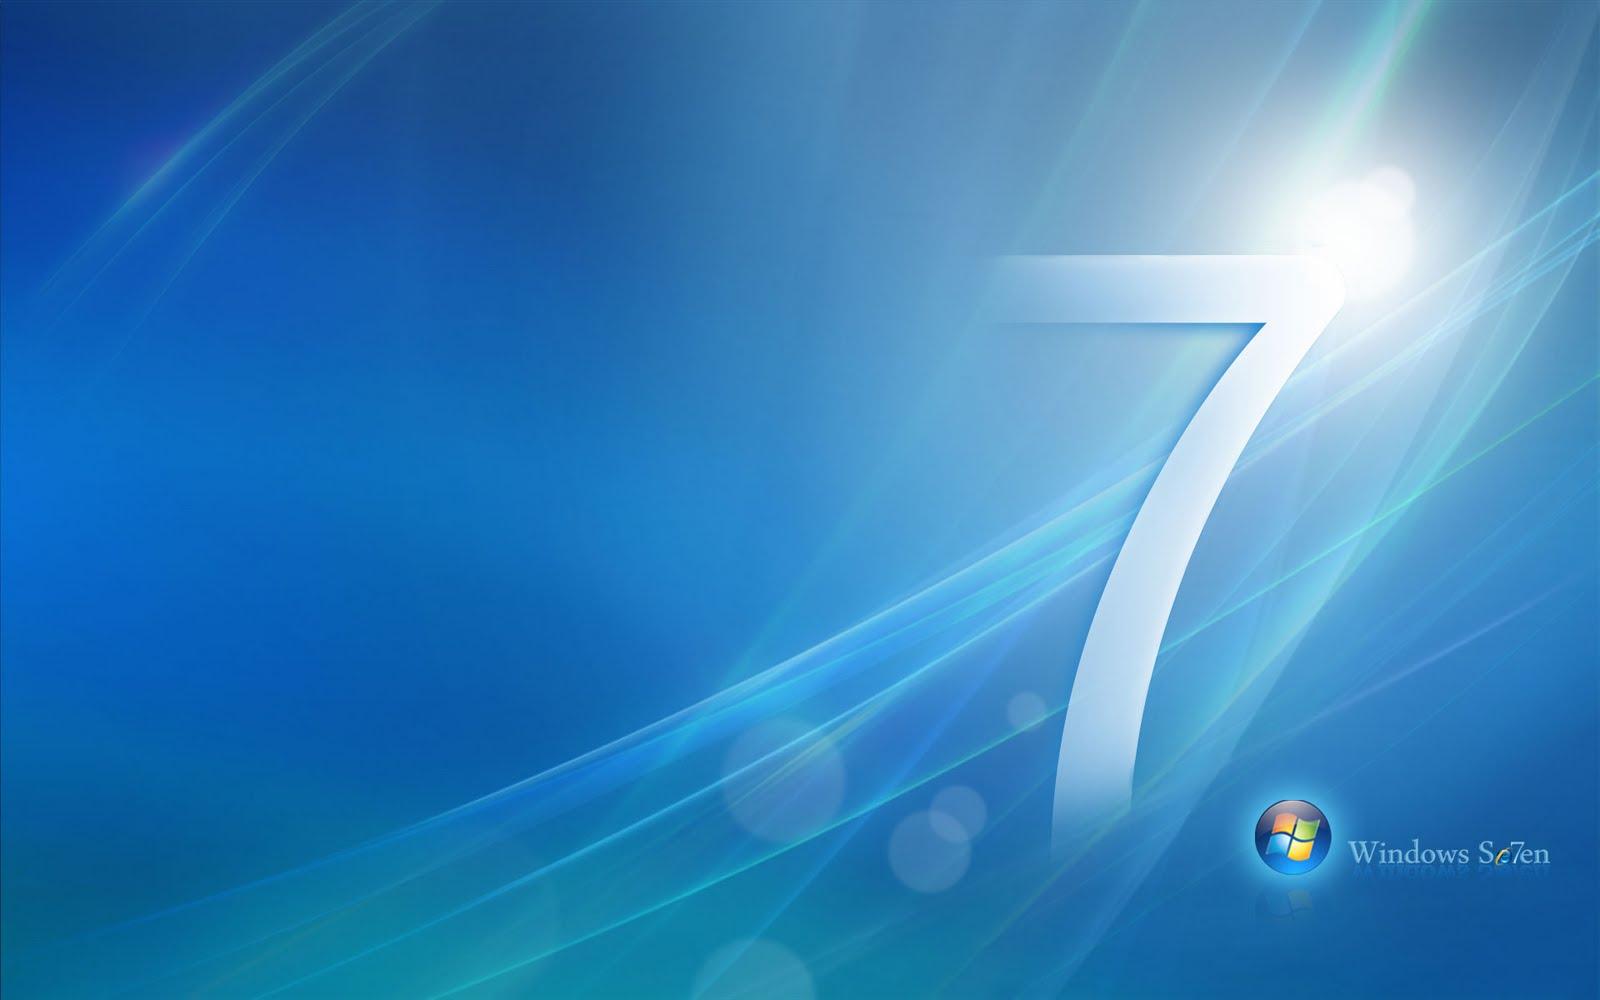 Papel De Parede Para Windows 7: Papel De Parede Win 7